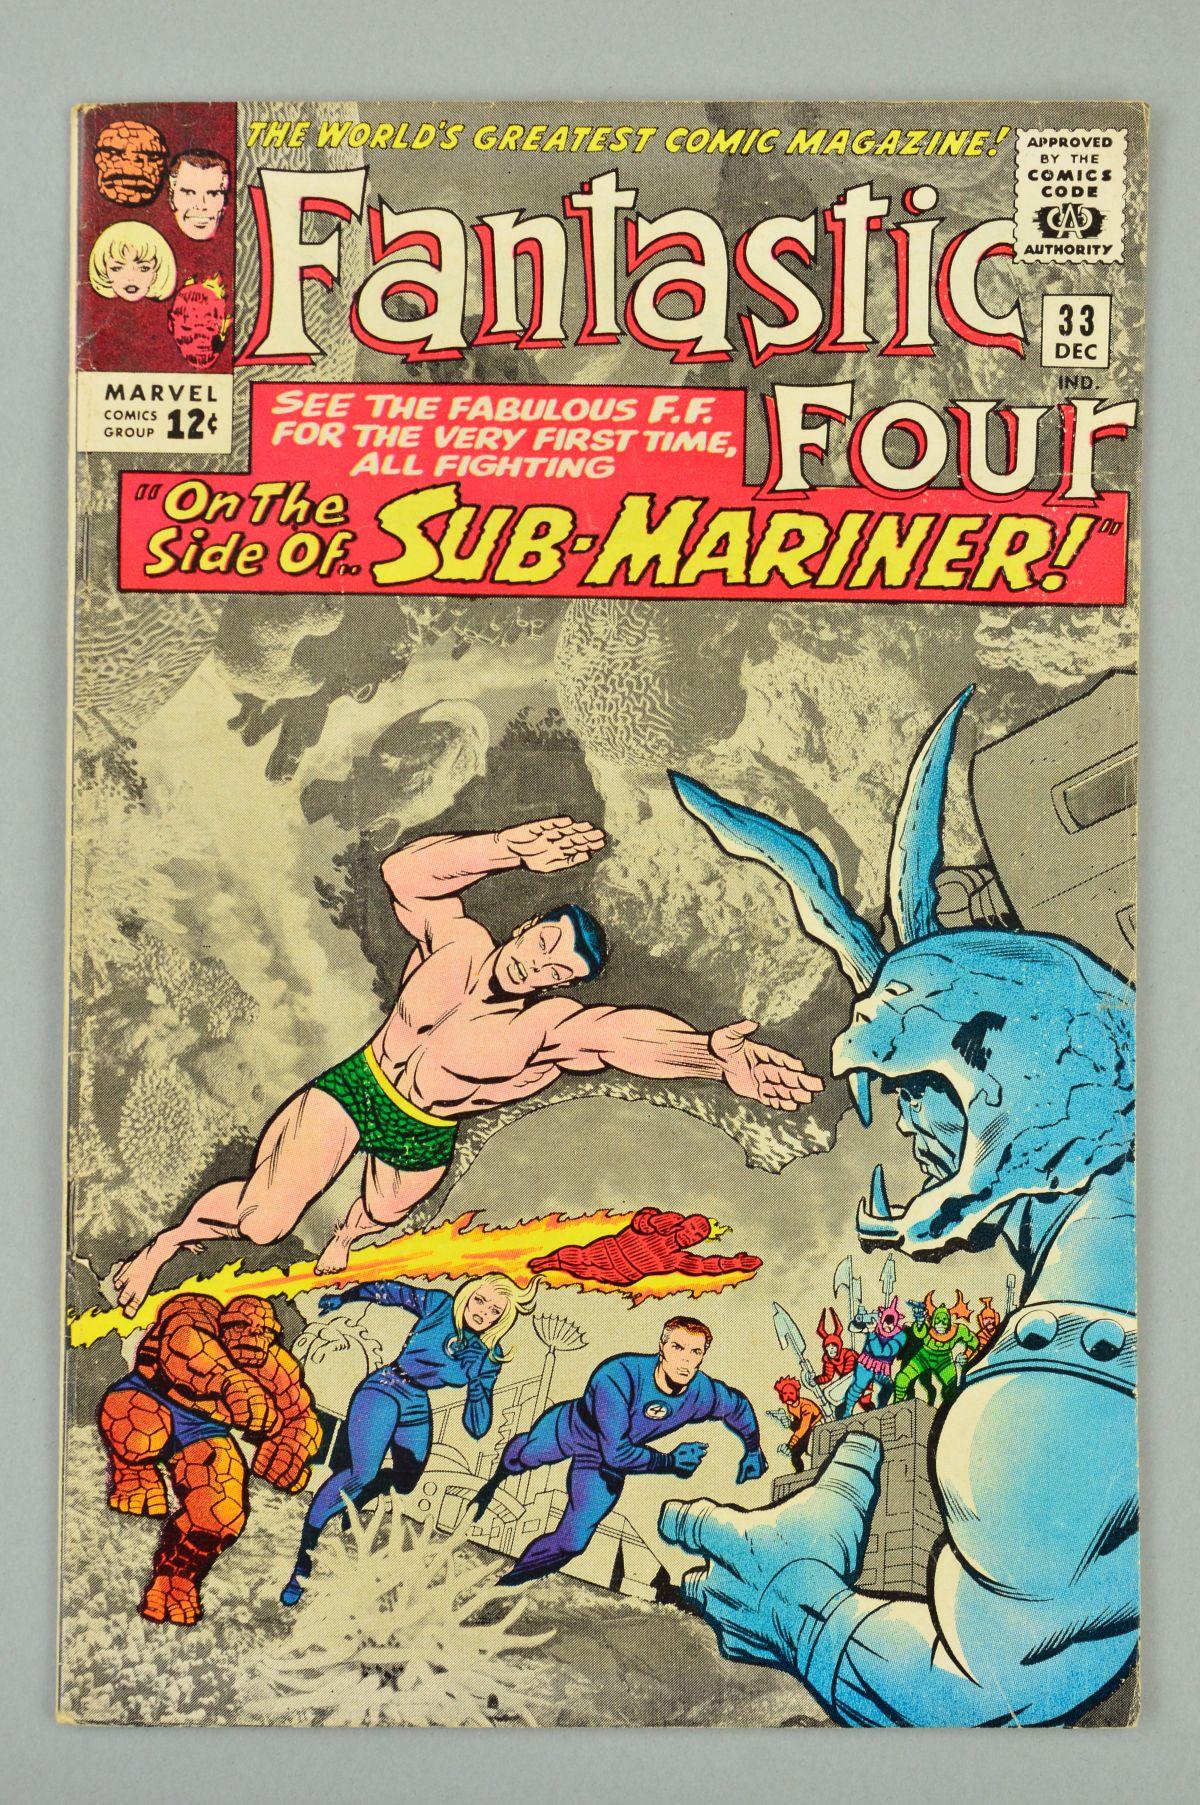 Lot 1832 - Fantastic Four (1961) #33, Published:December 10, 1964, Writer:Stan Lee, Penciller:Jack Kirby, Cover